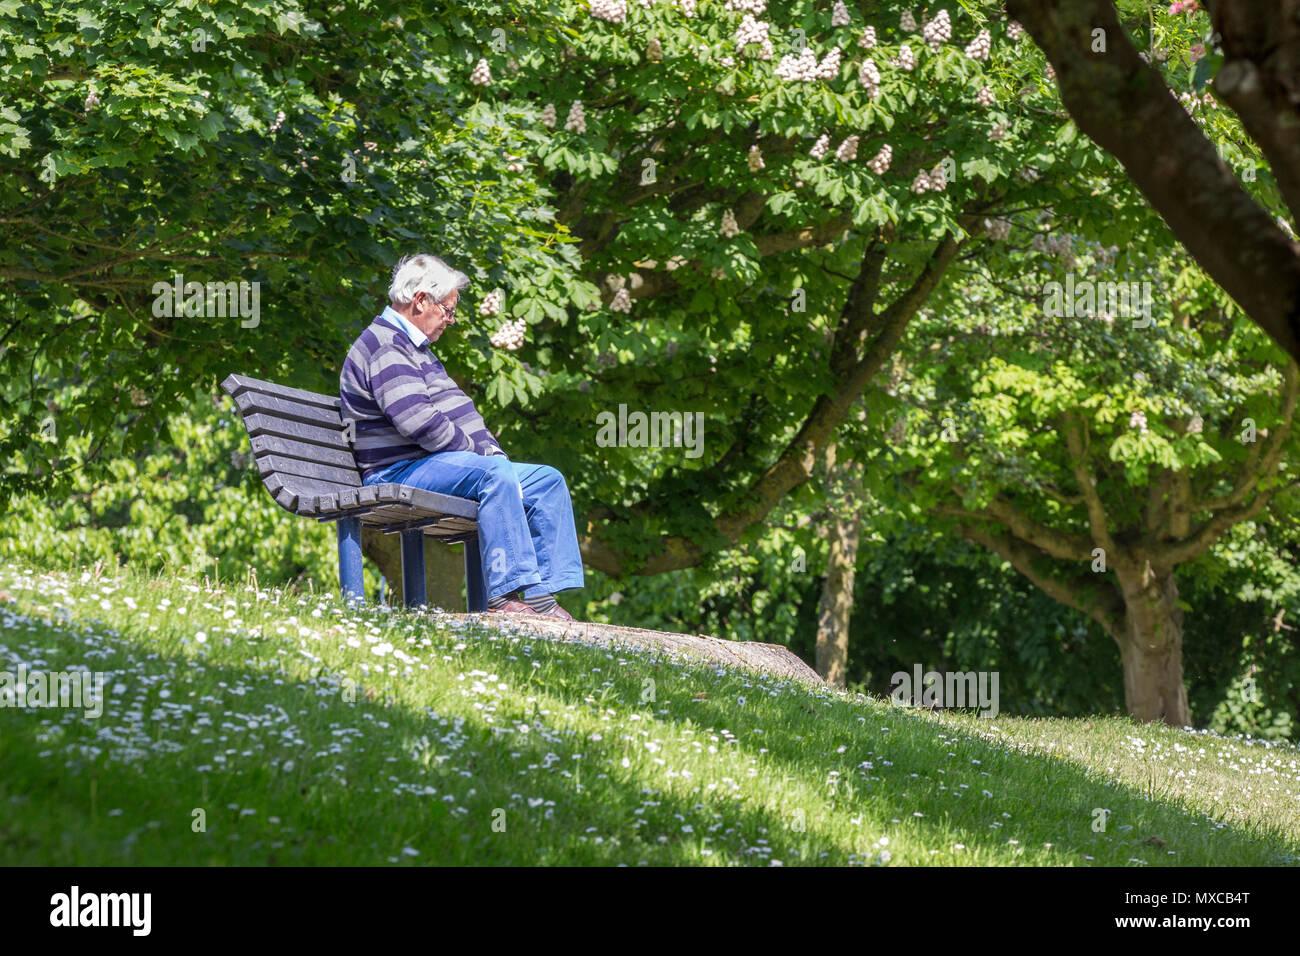 Un hombre sentado solo en un banco de bosques Imagen De Stock